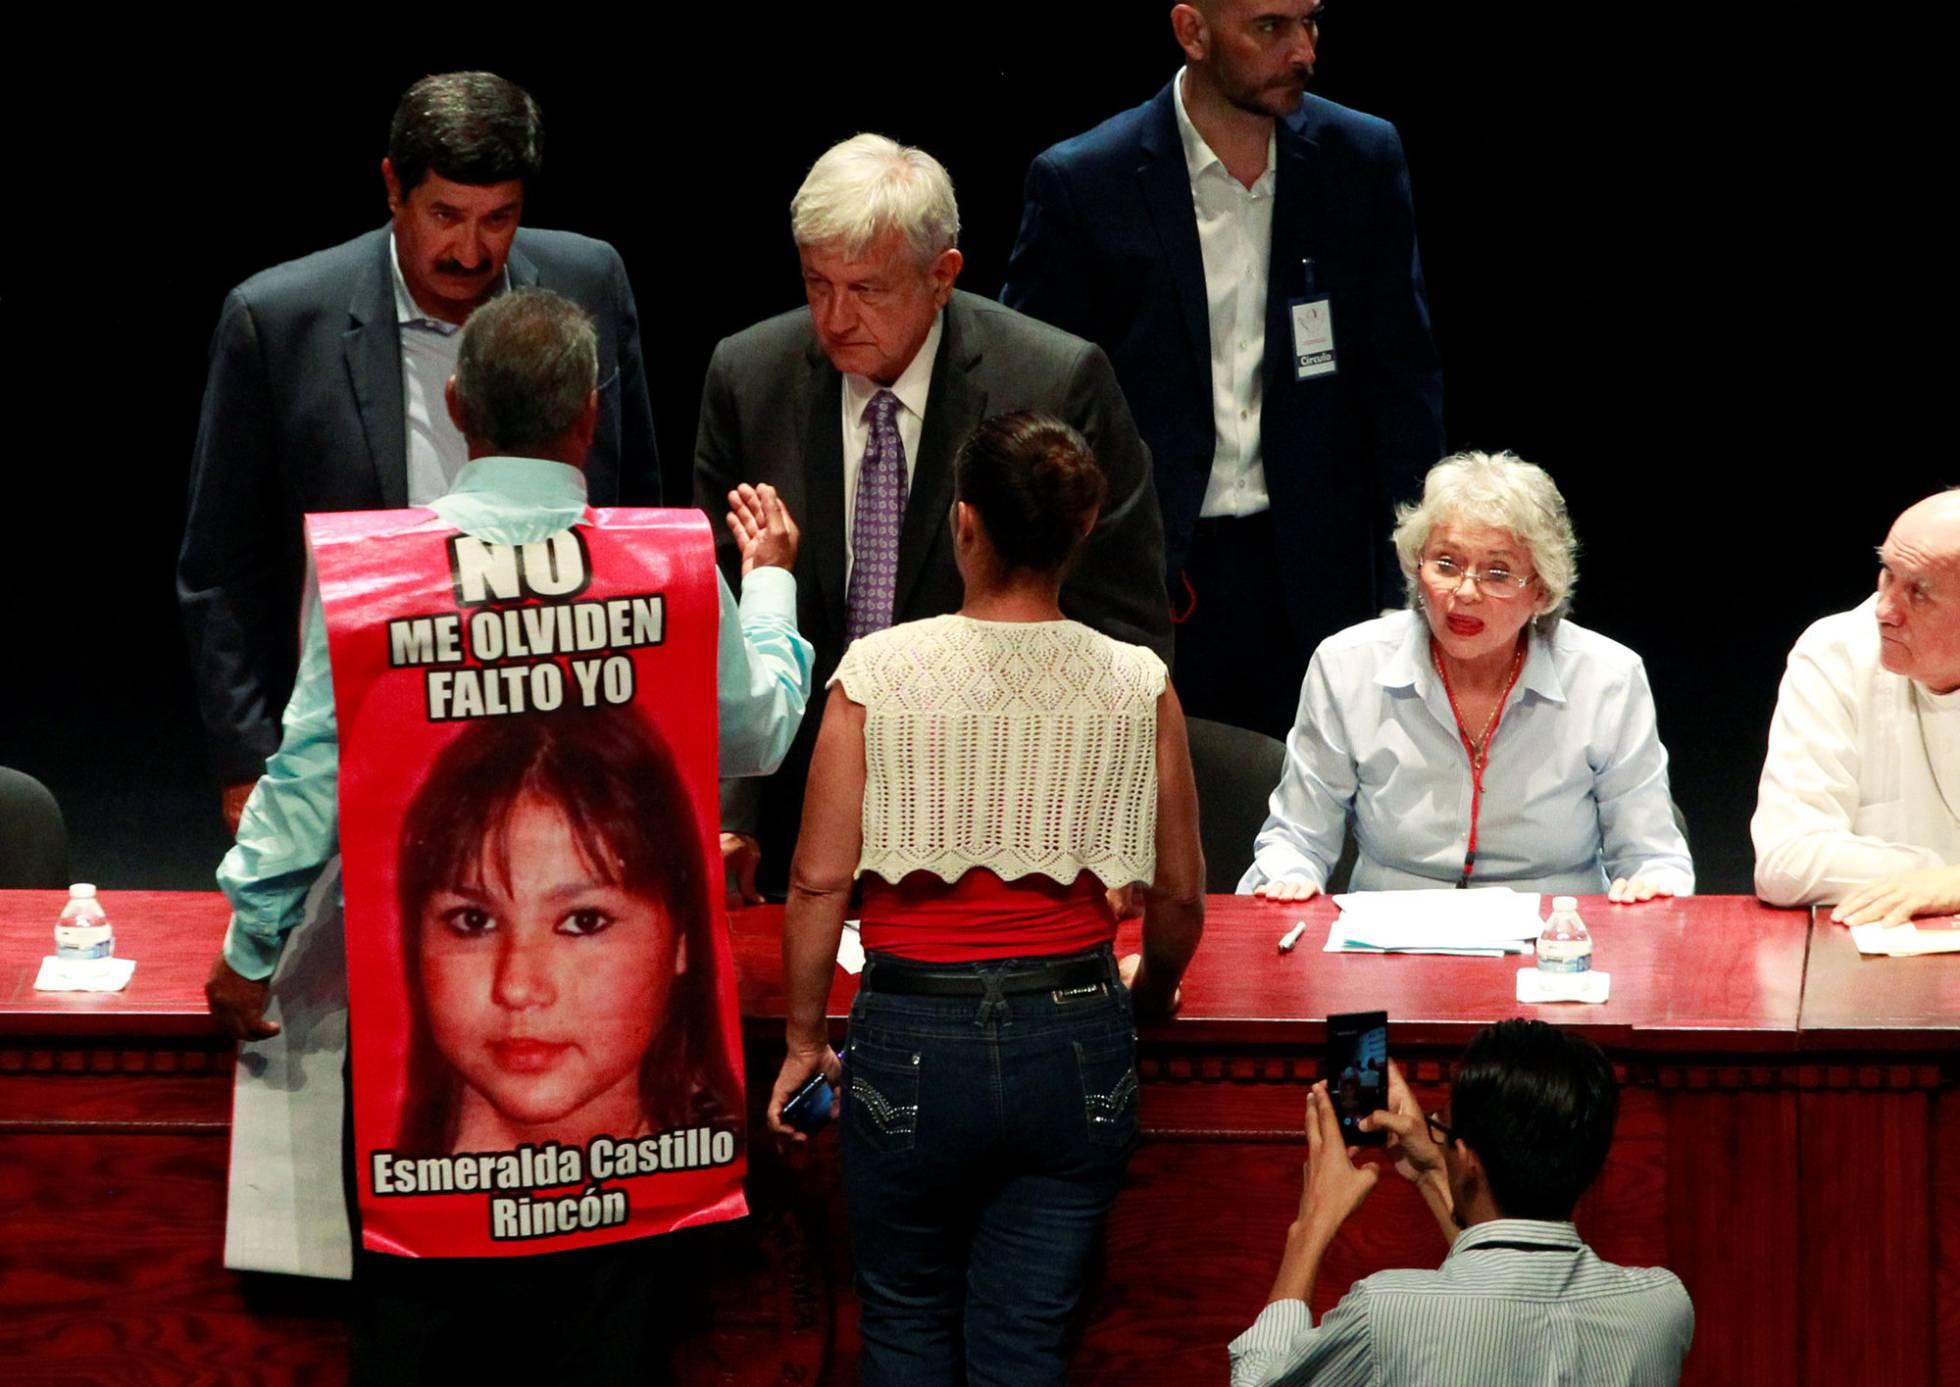 La palabra �perd�n� causa pol�mica en el foro de pacificaci�n de L�pez Obrador